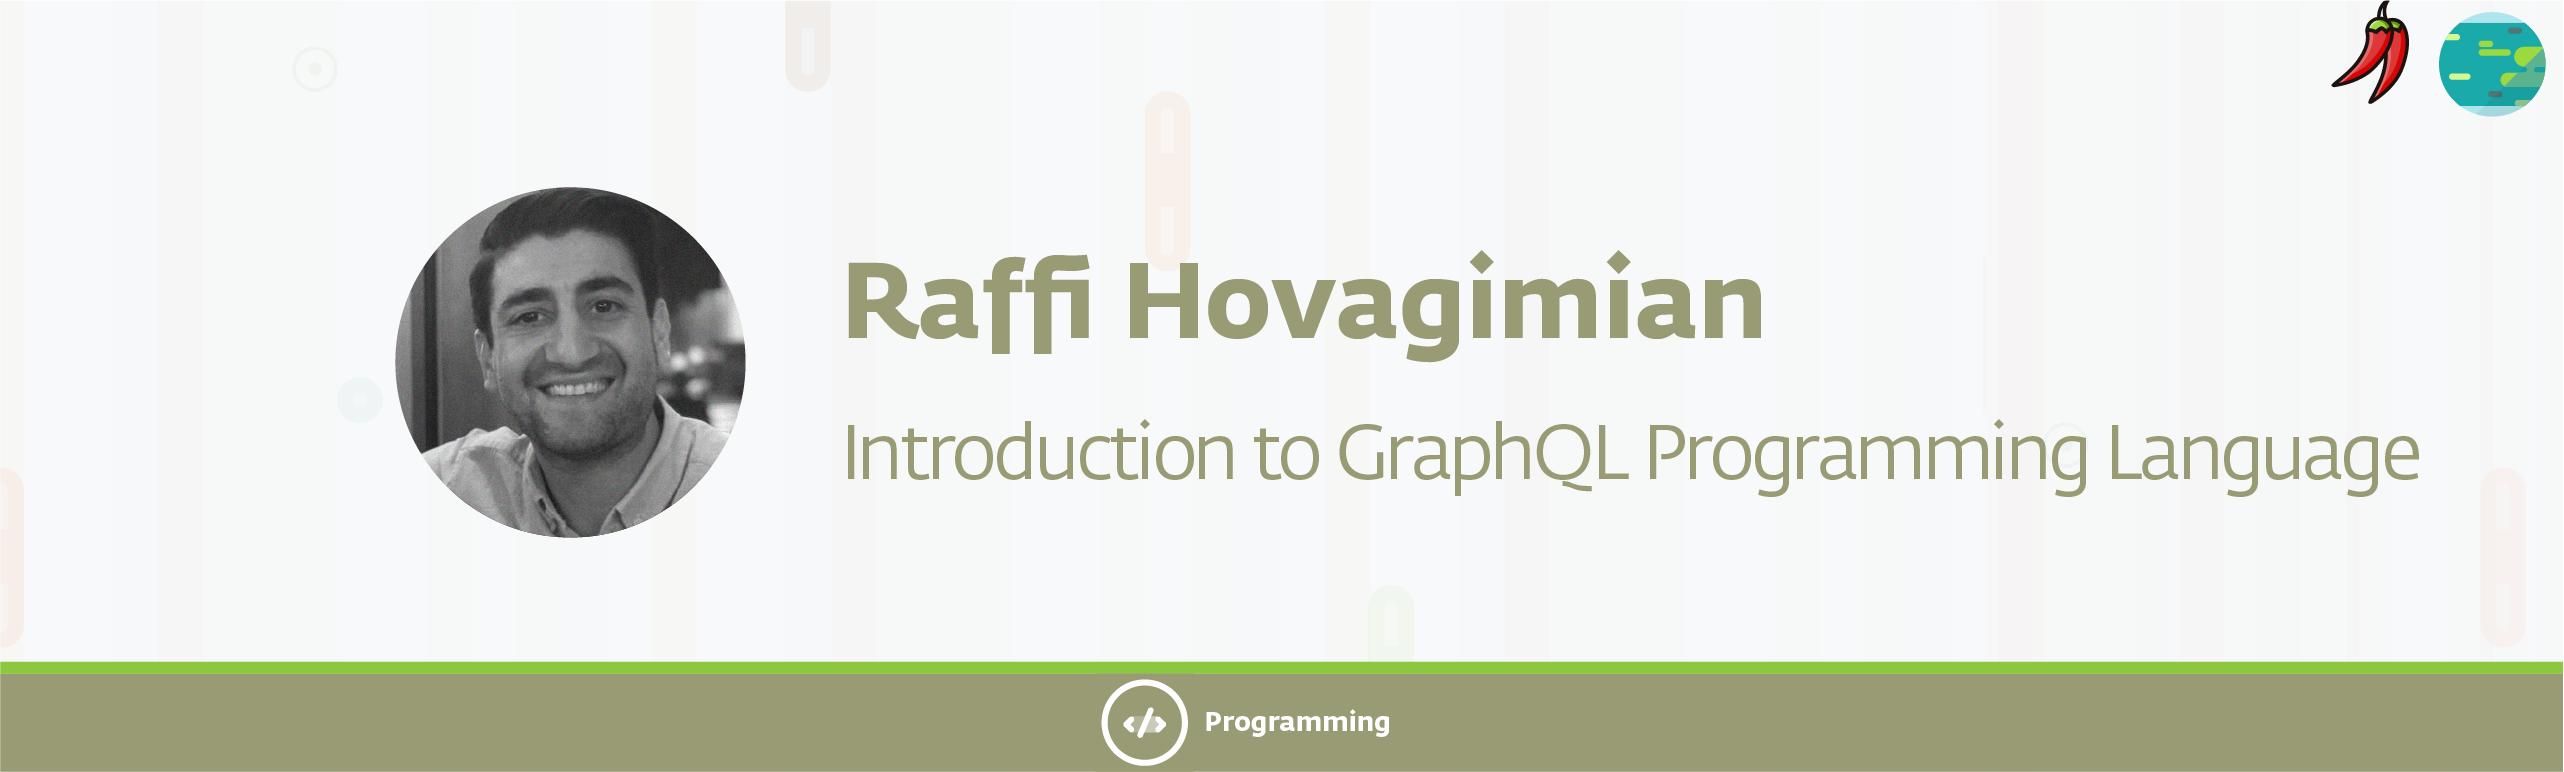 2 labs visual 16 - Introduction to GraphQL Programming Language